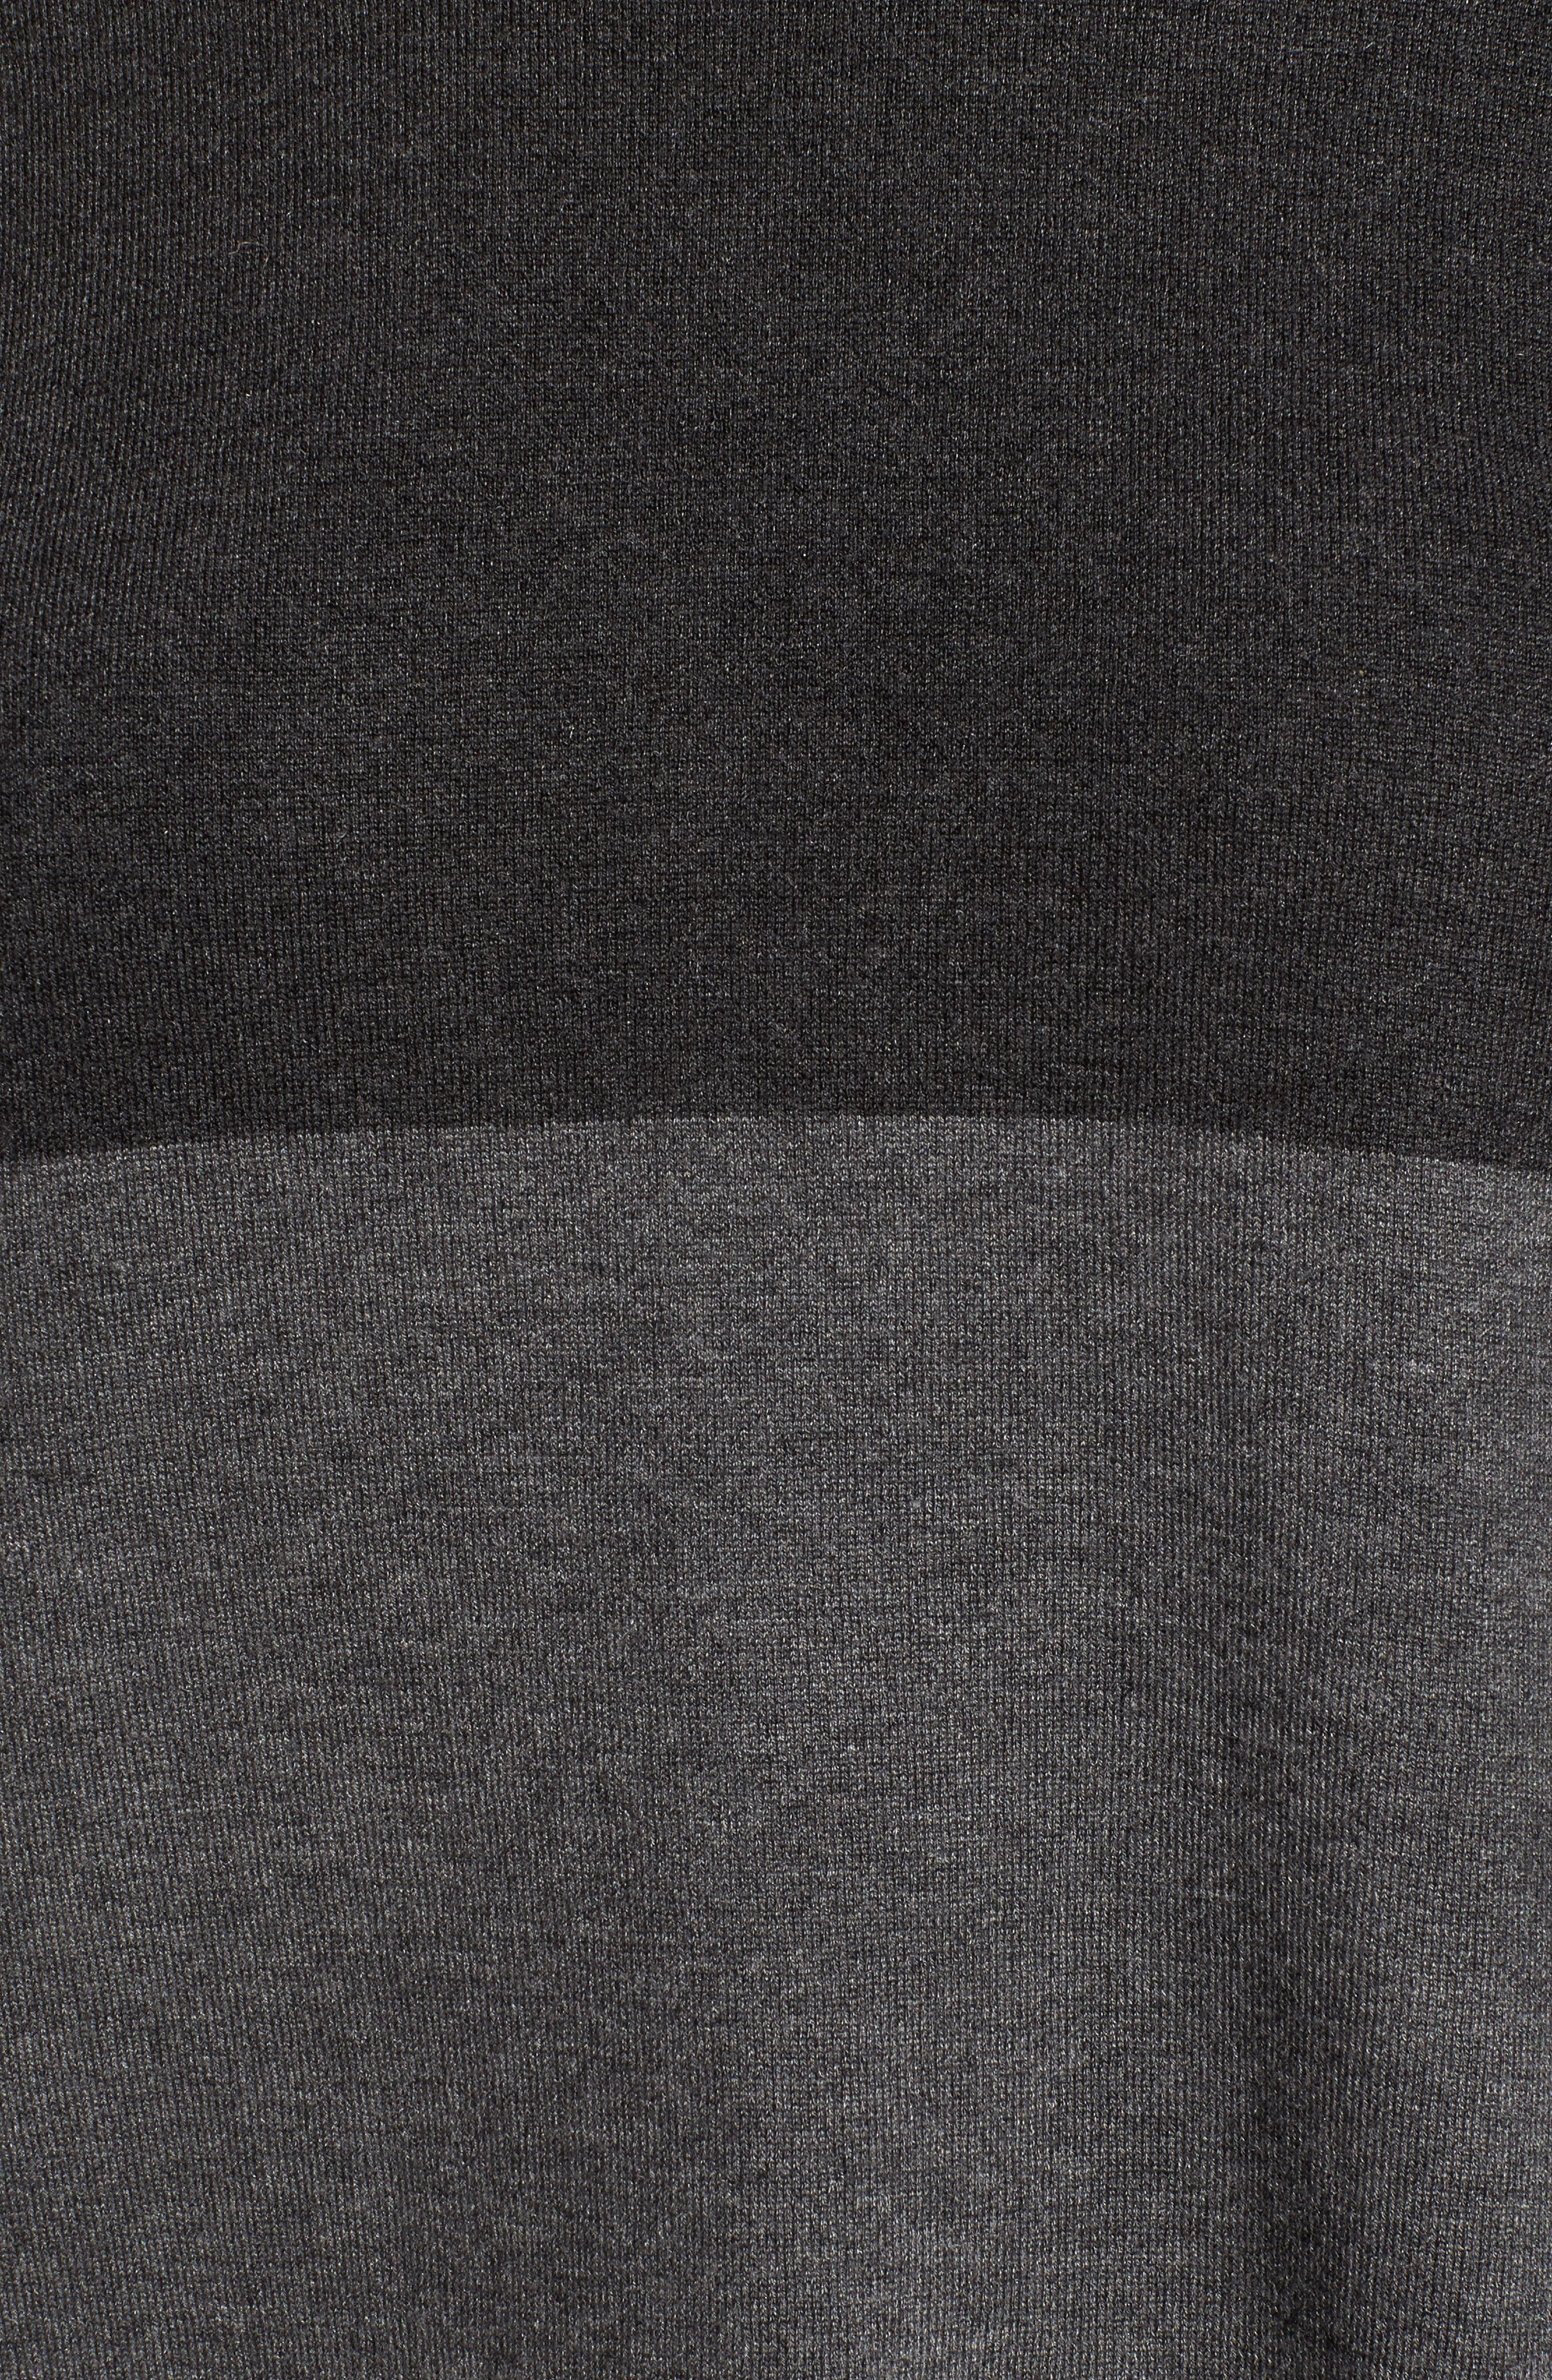 Colorblock Tencel<sup>®</sup> Blend Sweater,                             Alternate thumbnail 5, color,                             064